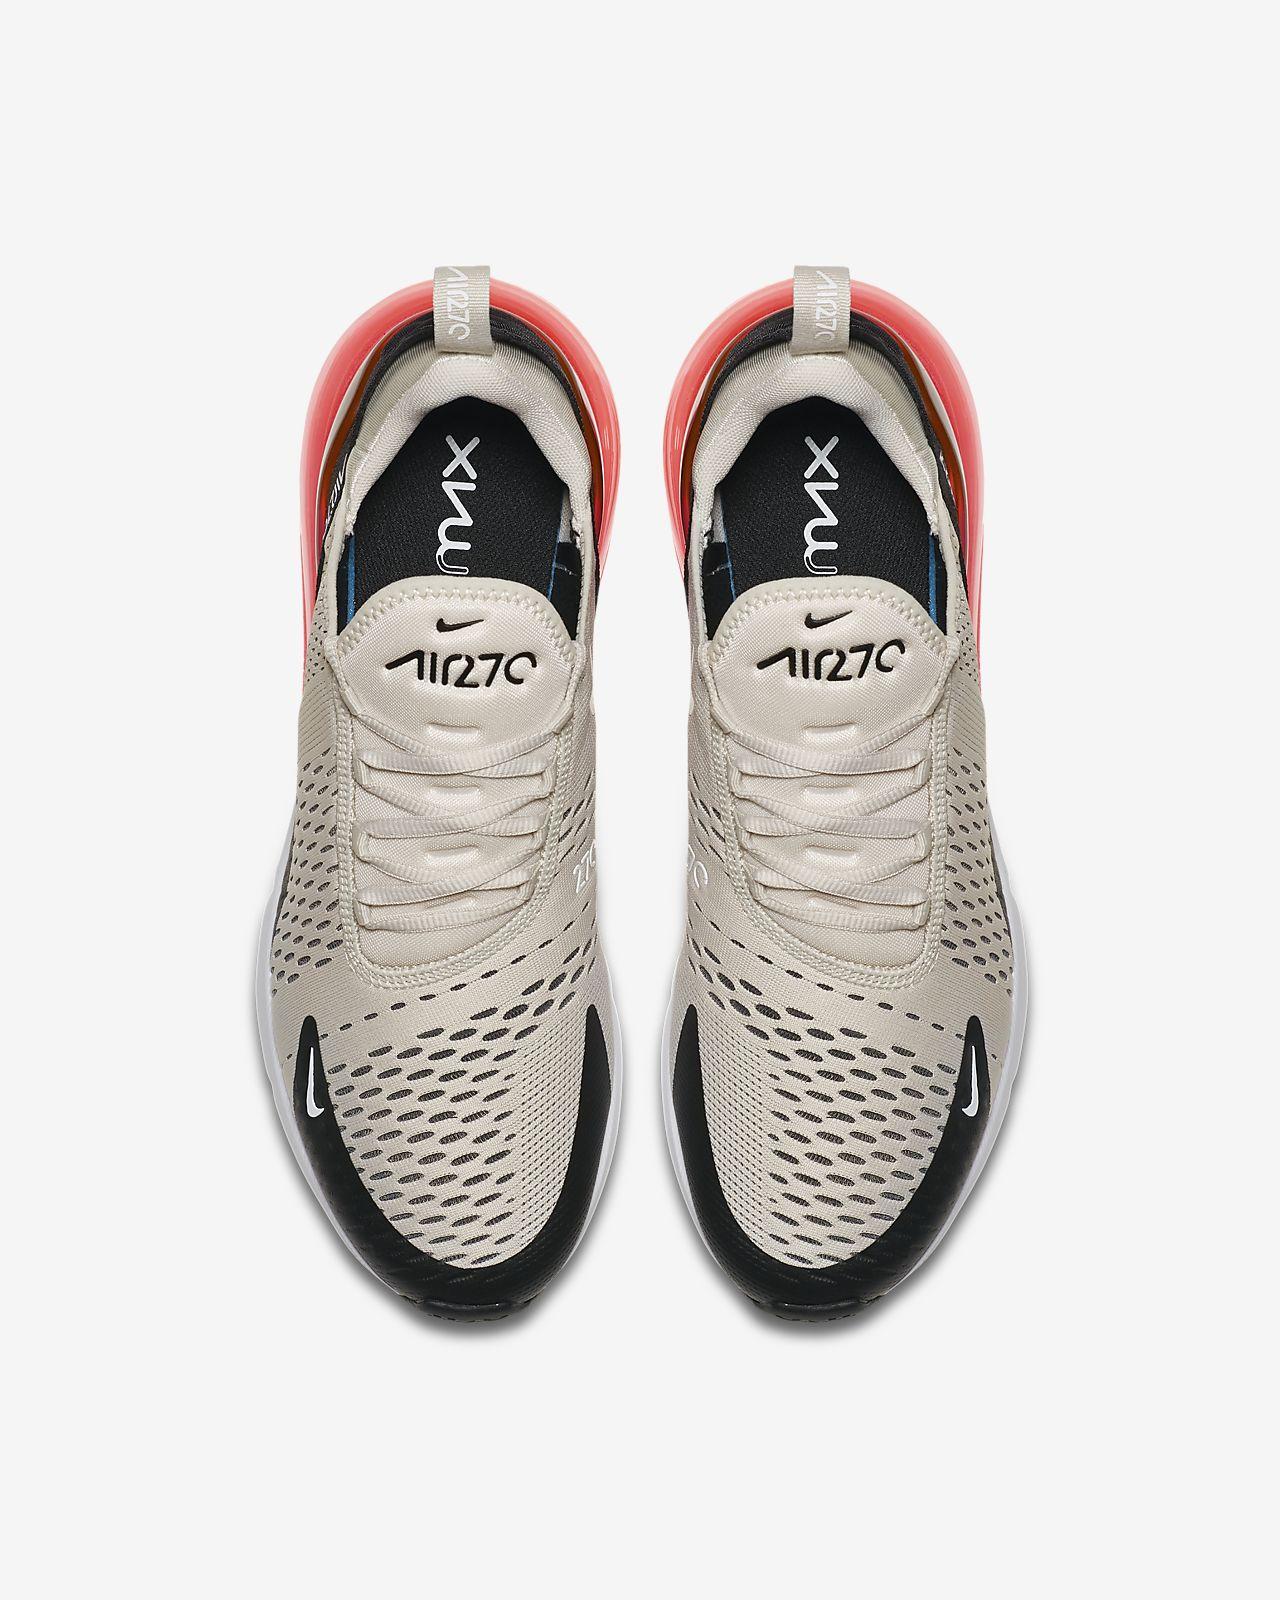 Nike VaporMax spento